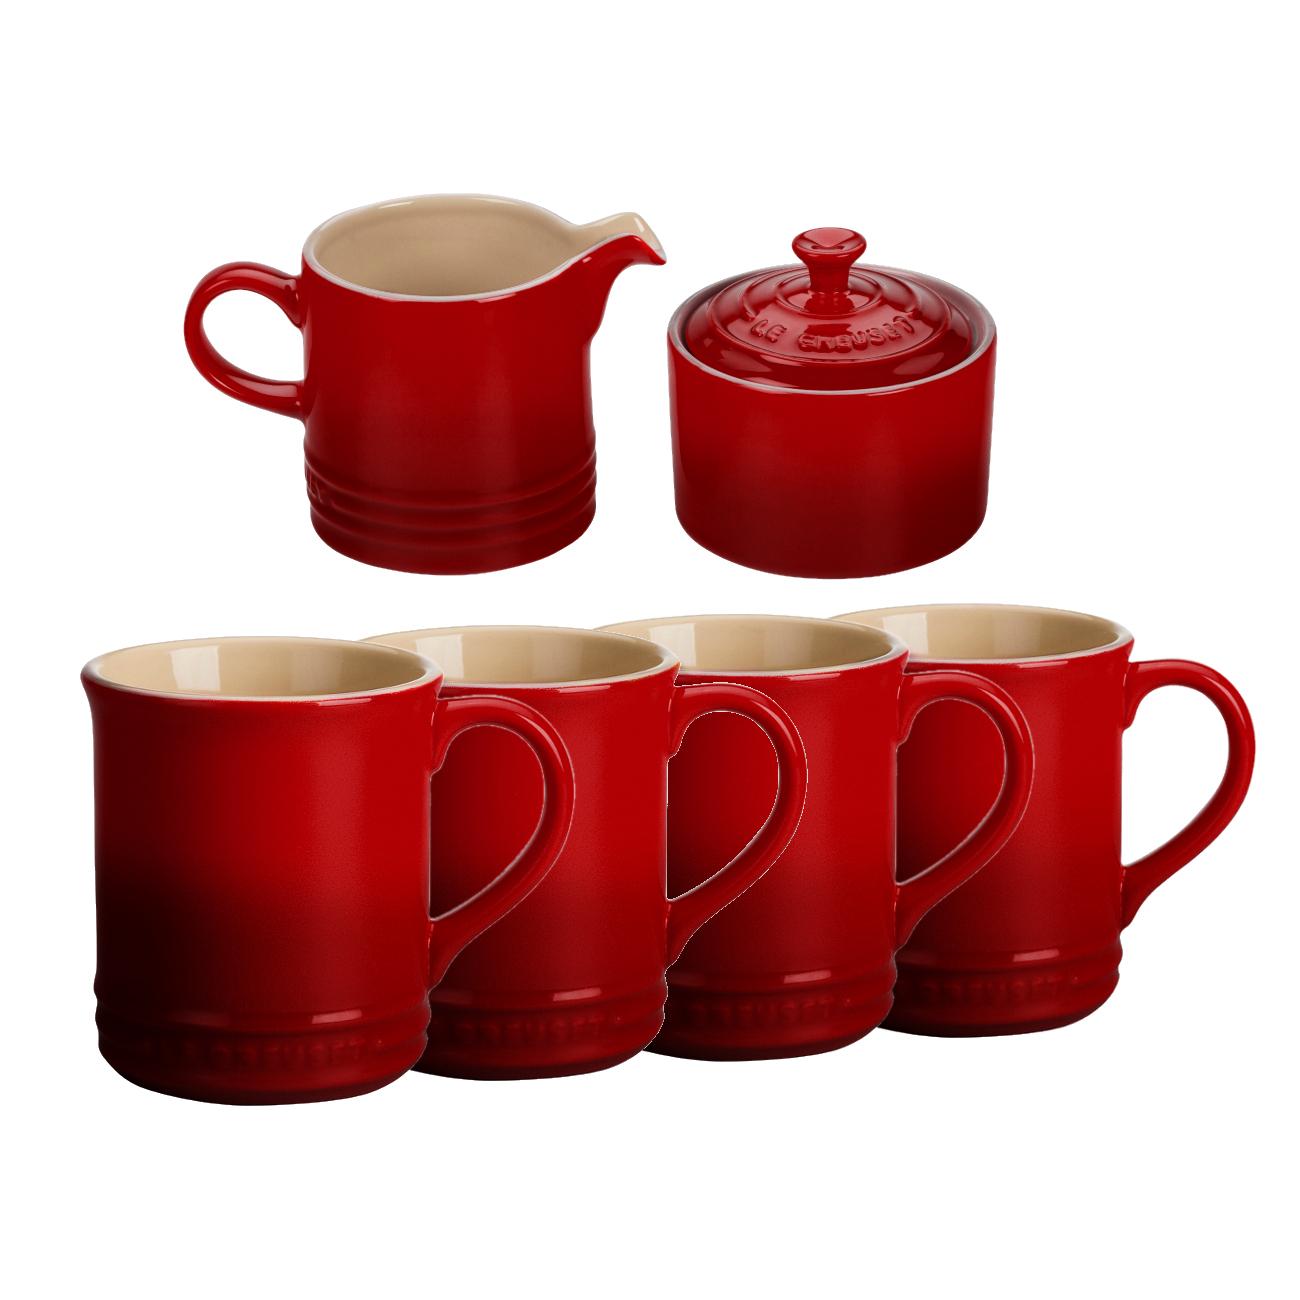 Le Creuset 6 Piece Cherry Stoneware Coffee or Tea Service Set With Mugs & Cream & Sugar Set